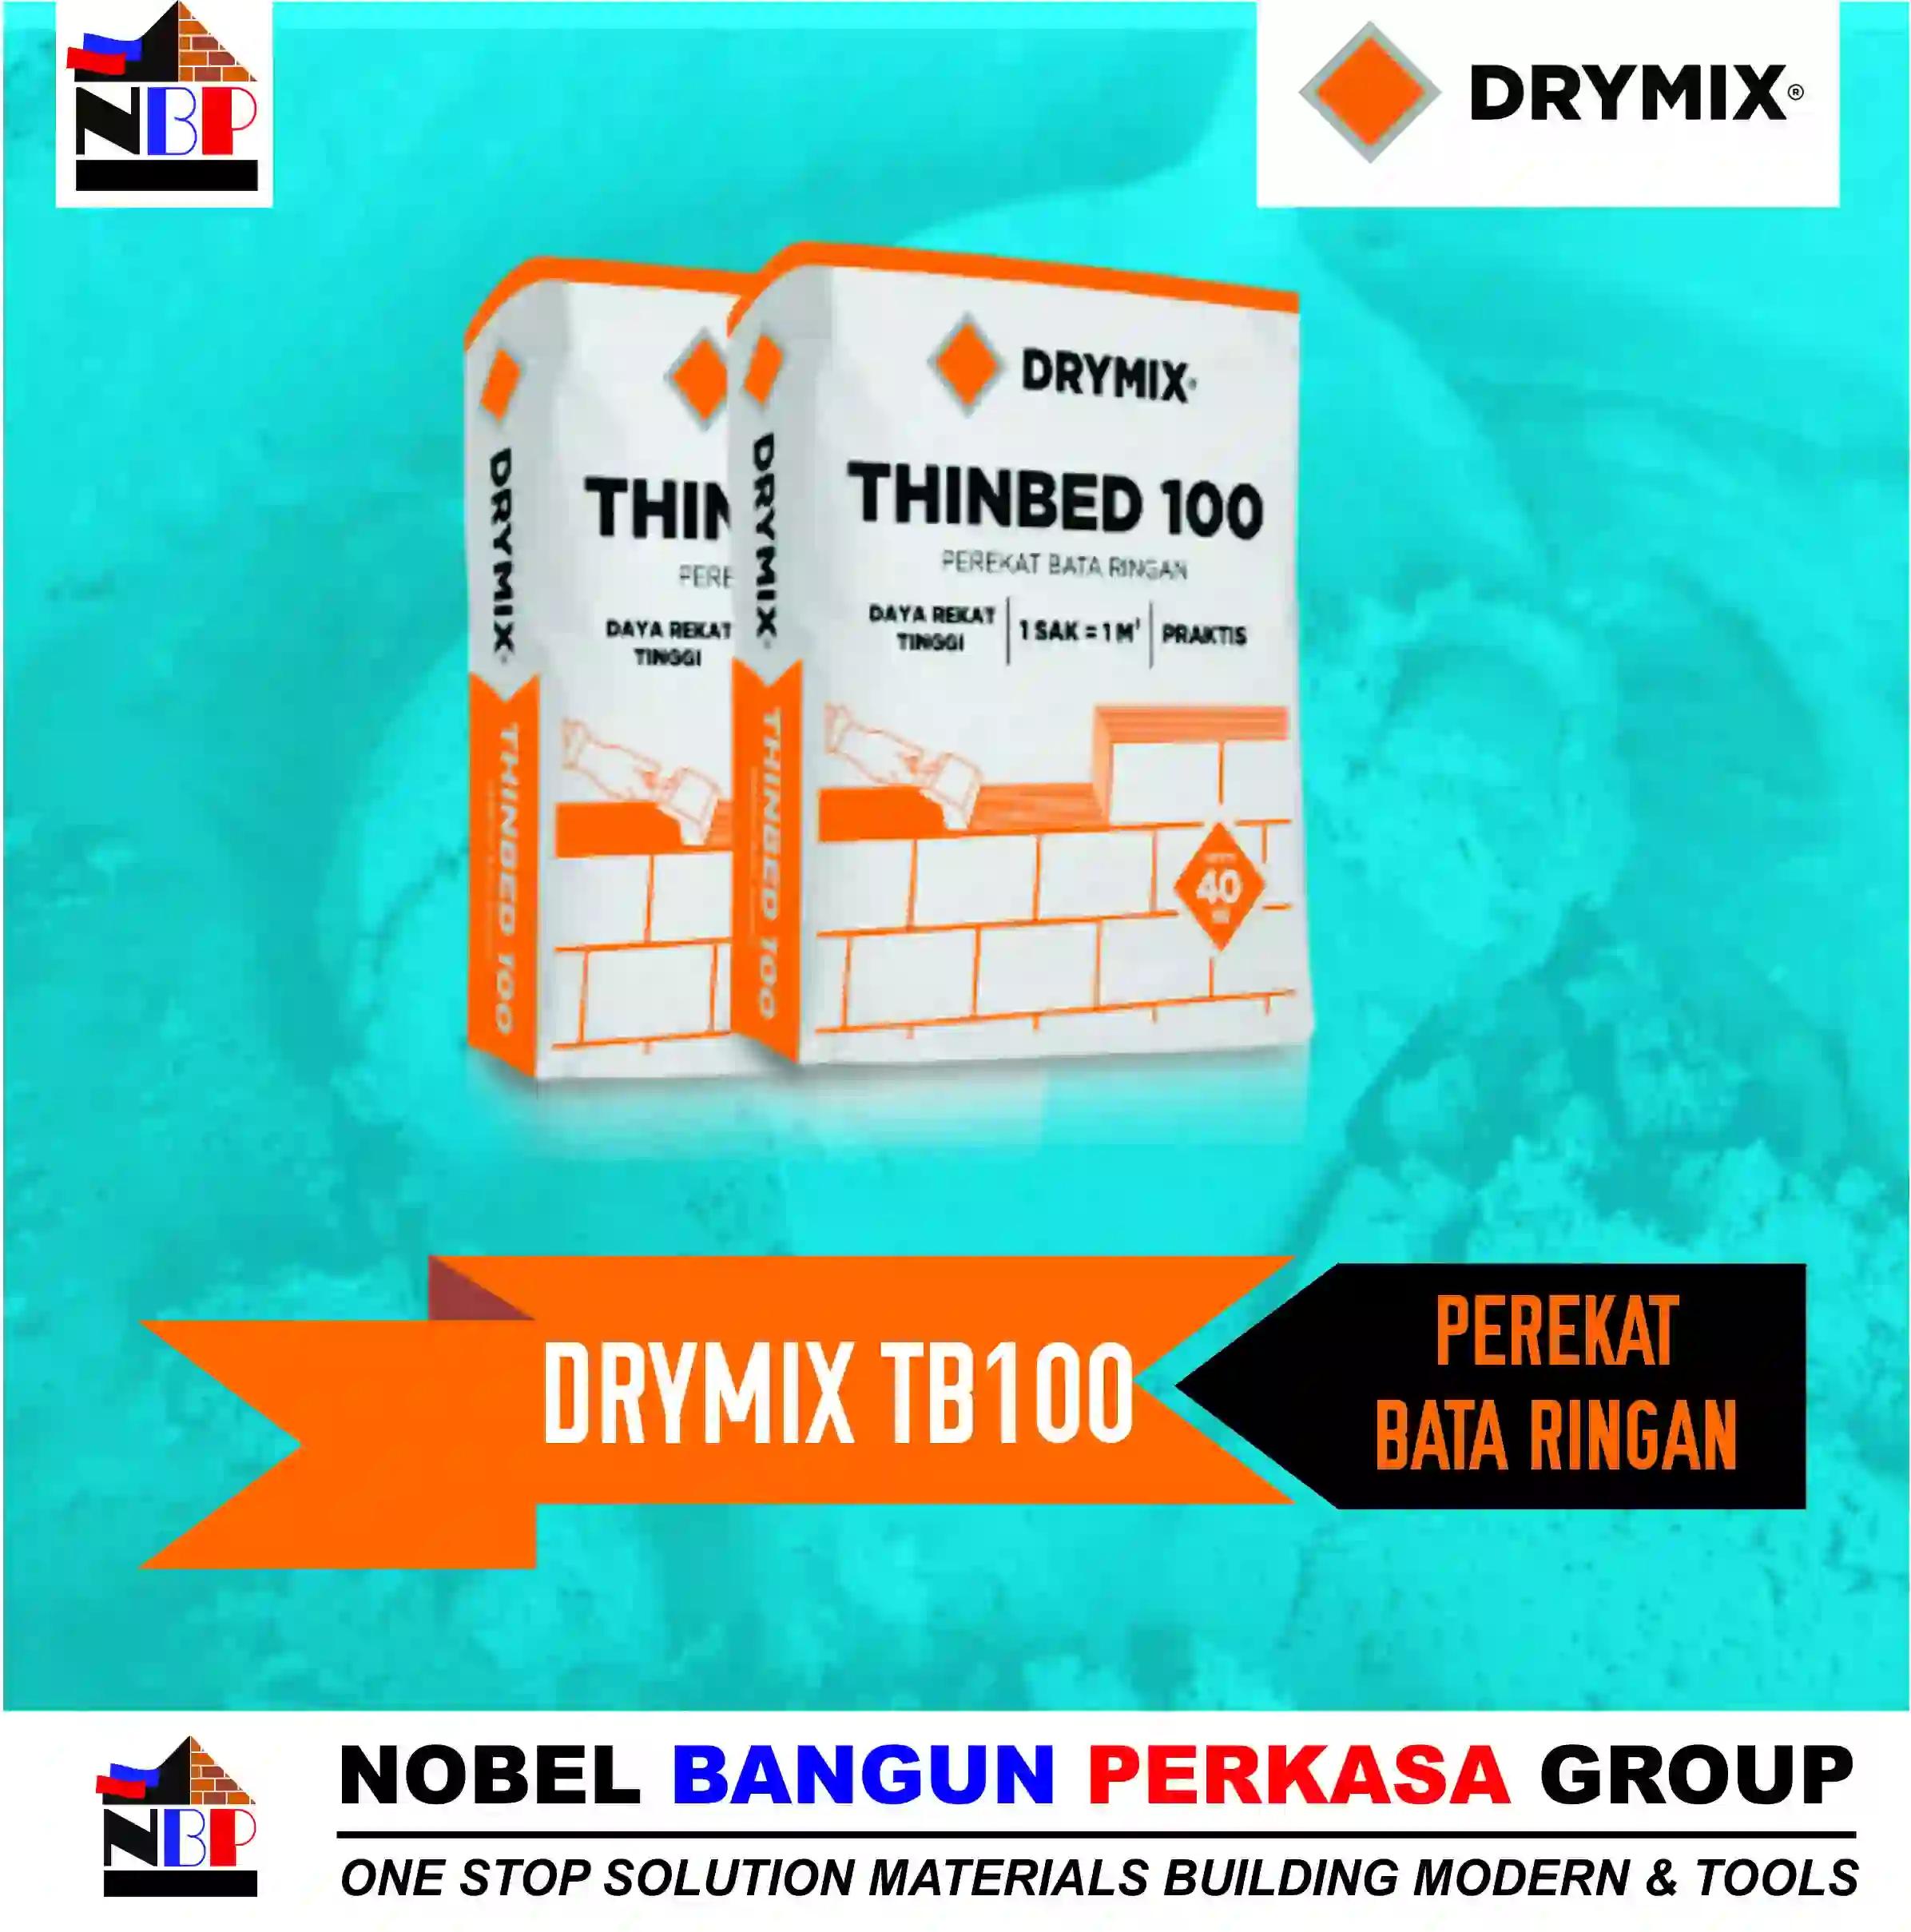 drymix tb 100 perekat bata ringan hebel